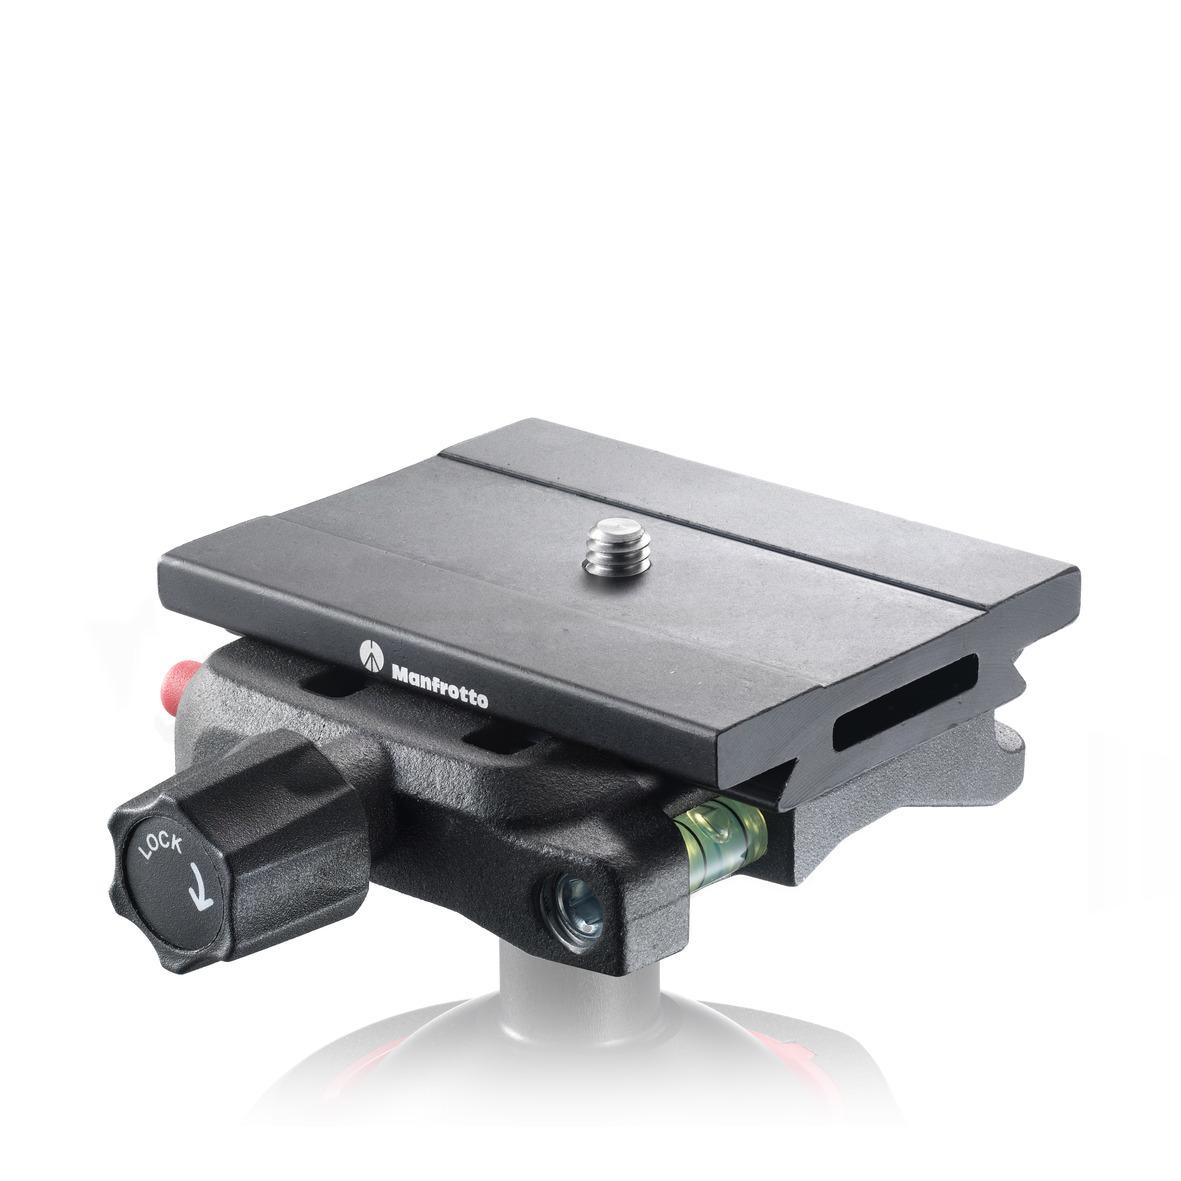 Manfrotto MSQ6 - adapter TOP LOCK z płytką MSQ6PL Manfrotto MSQ6 - adapter TOP LOCK z płytką MSQ6PL